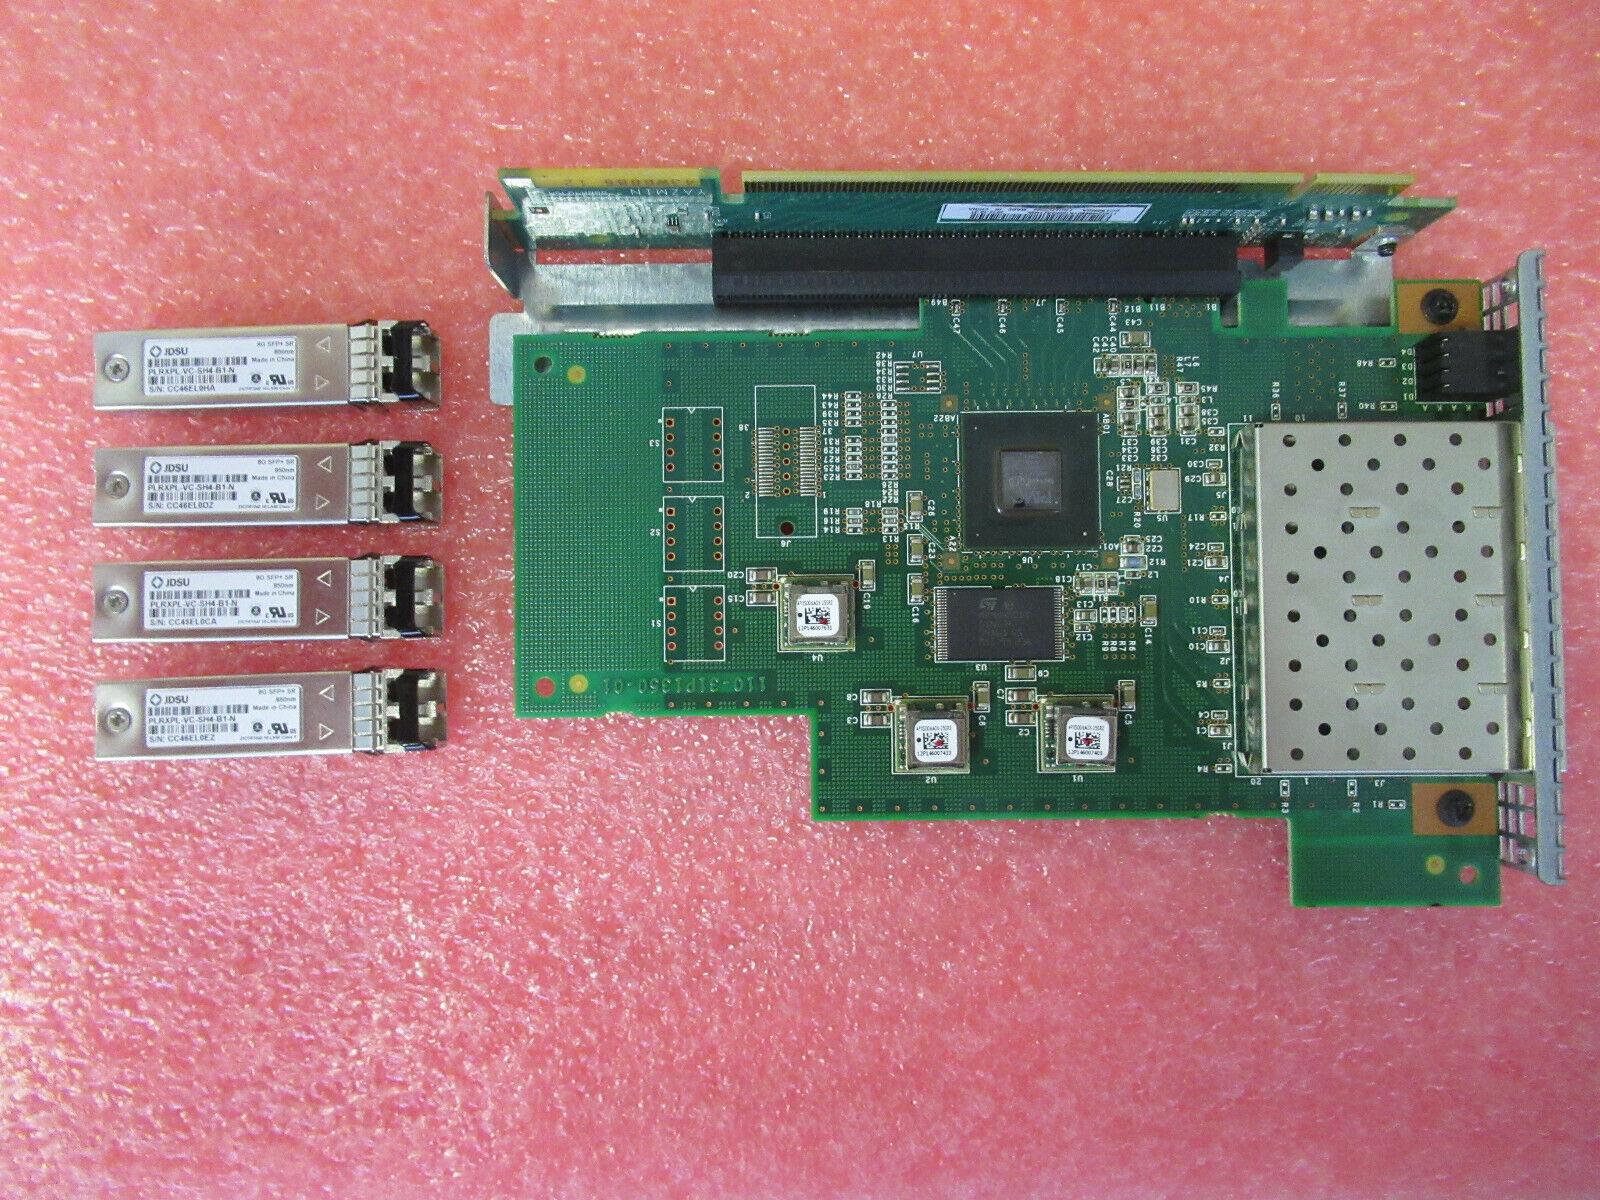 IBM 31P1641 X3550 4-Port 8GB Ethernet PCI-E x8 Network Adapter 4x 8GB SFP